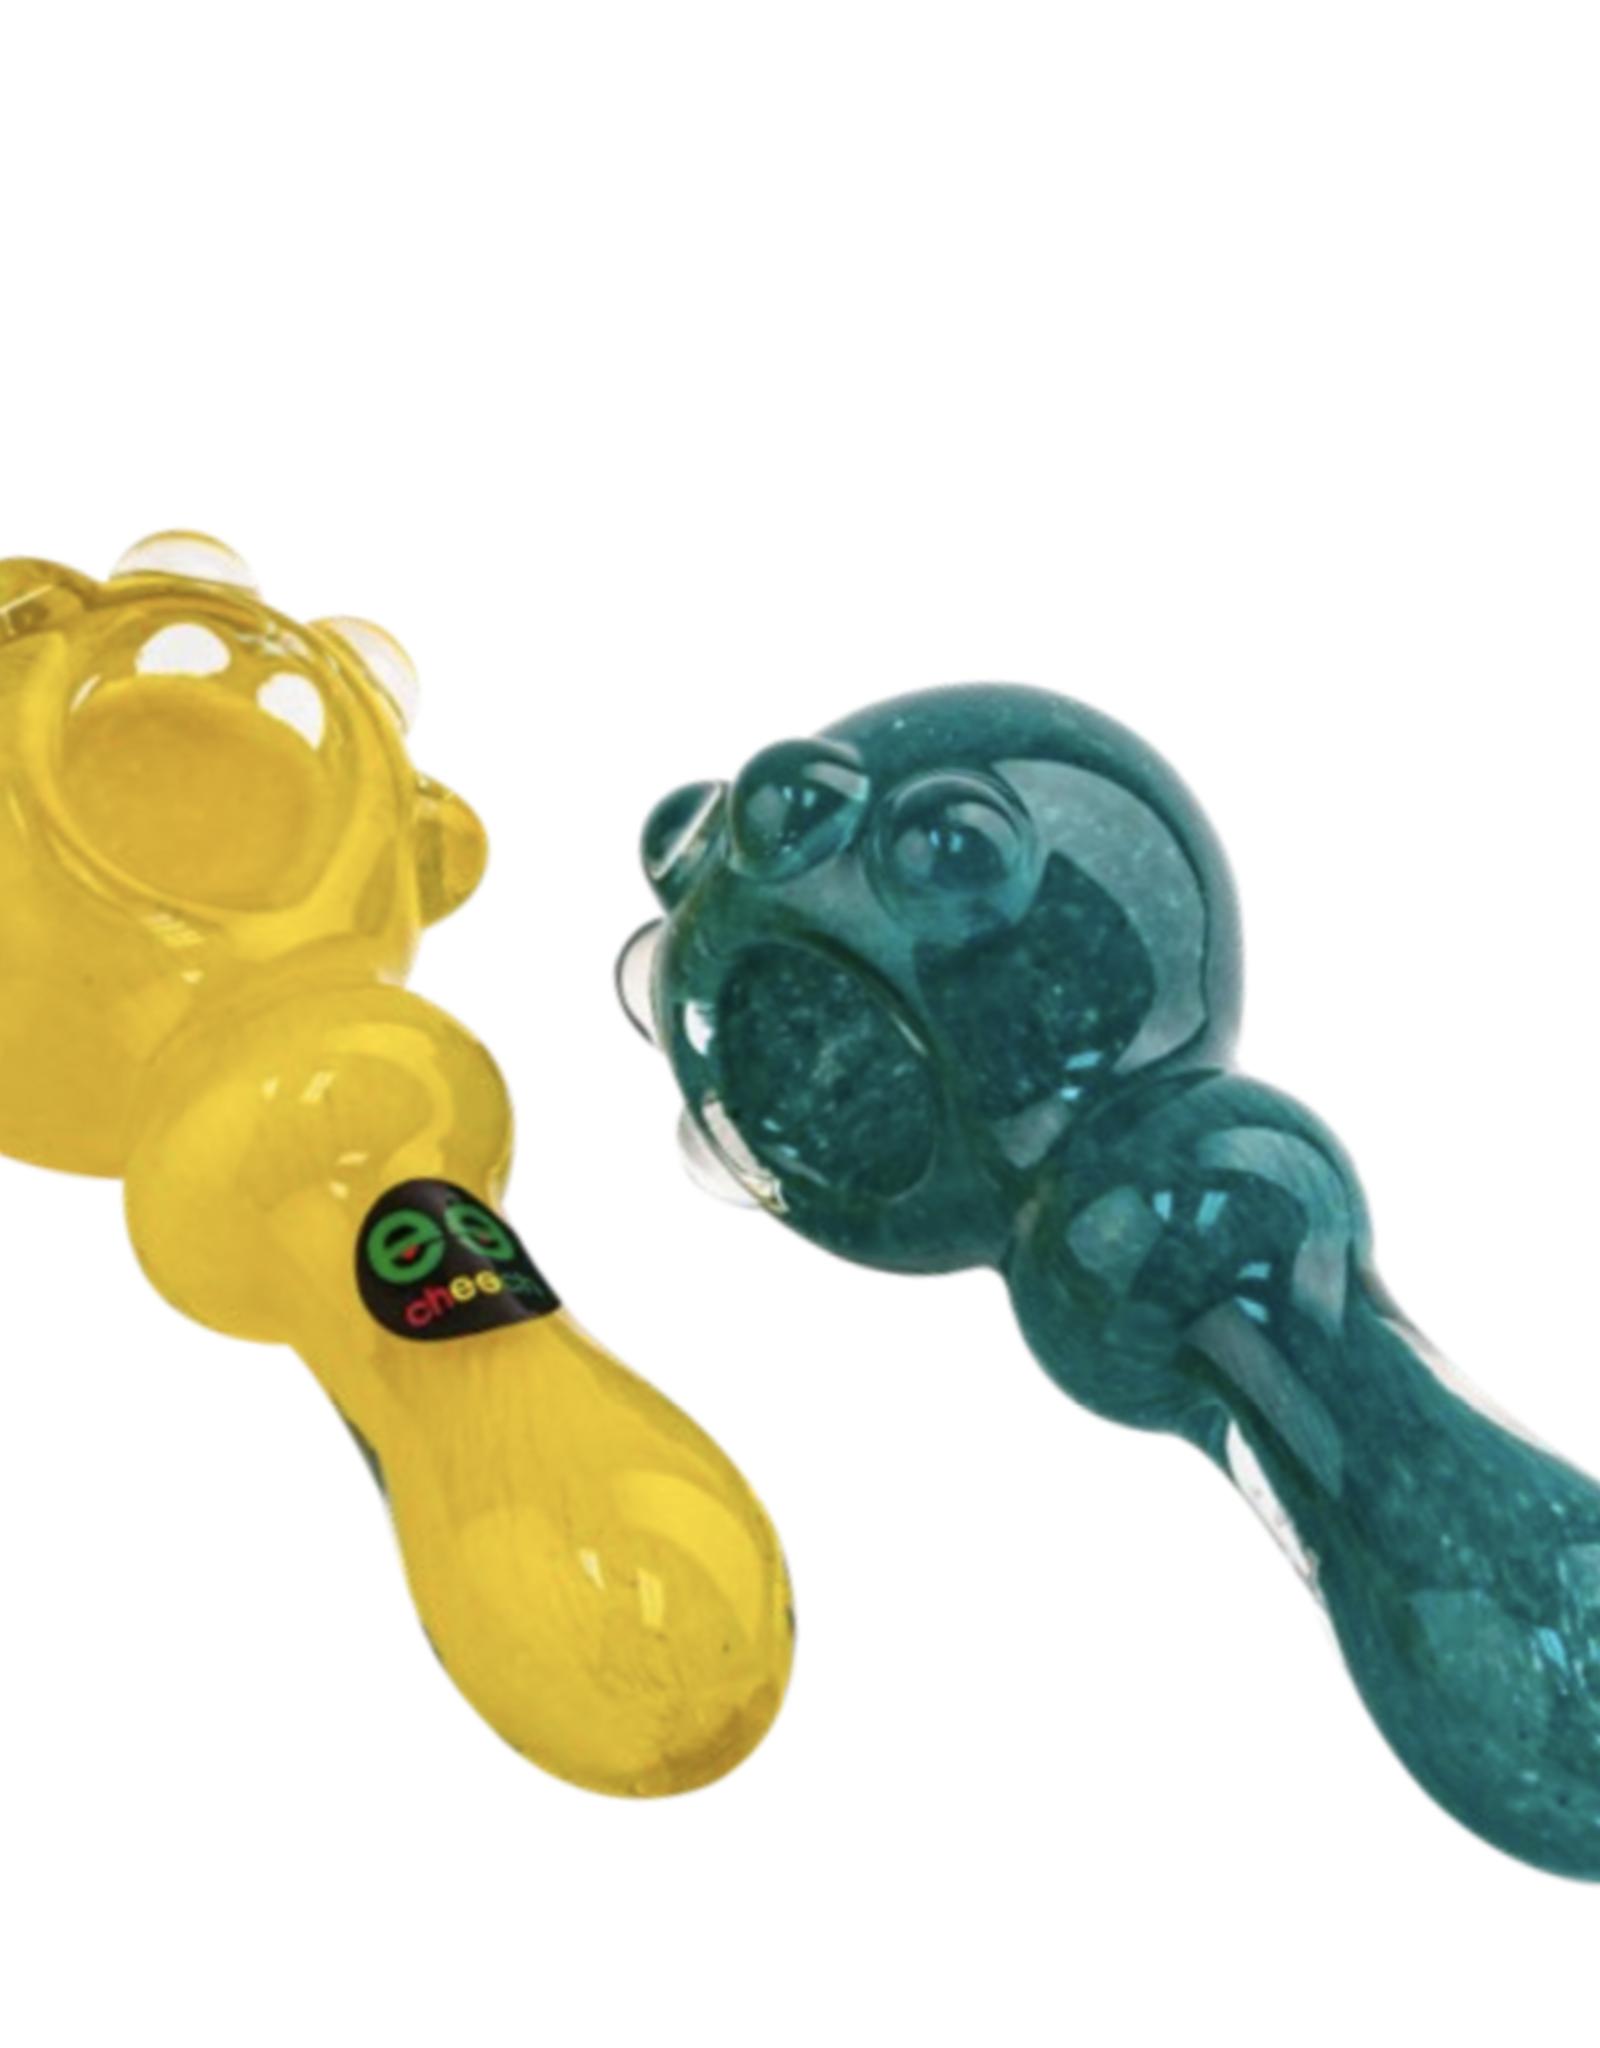 "Cheech 3.75"" Colourful Pipe w/Nubs by Cheech"